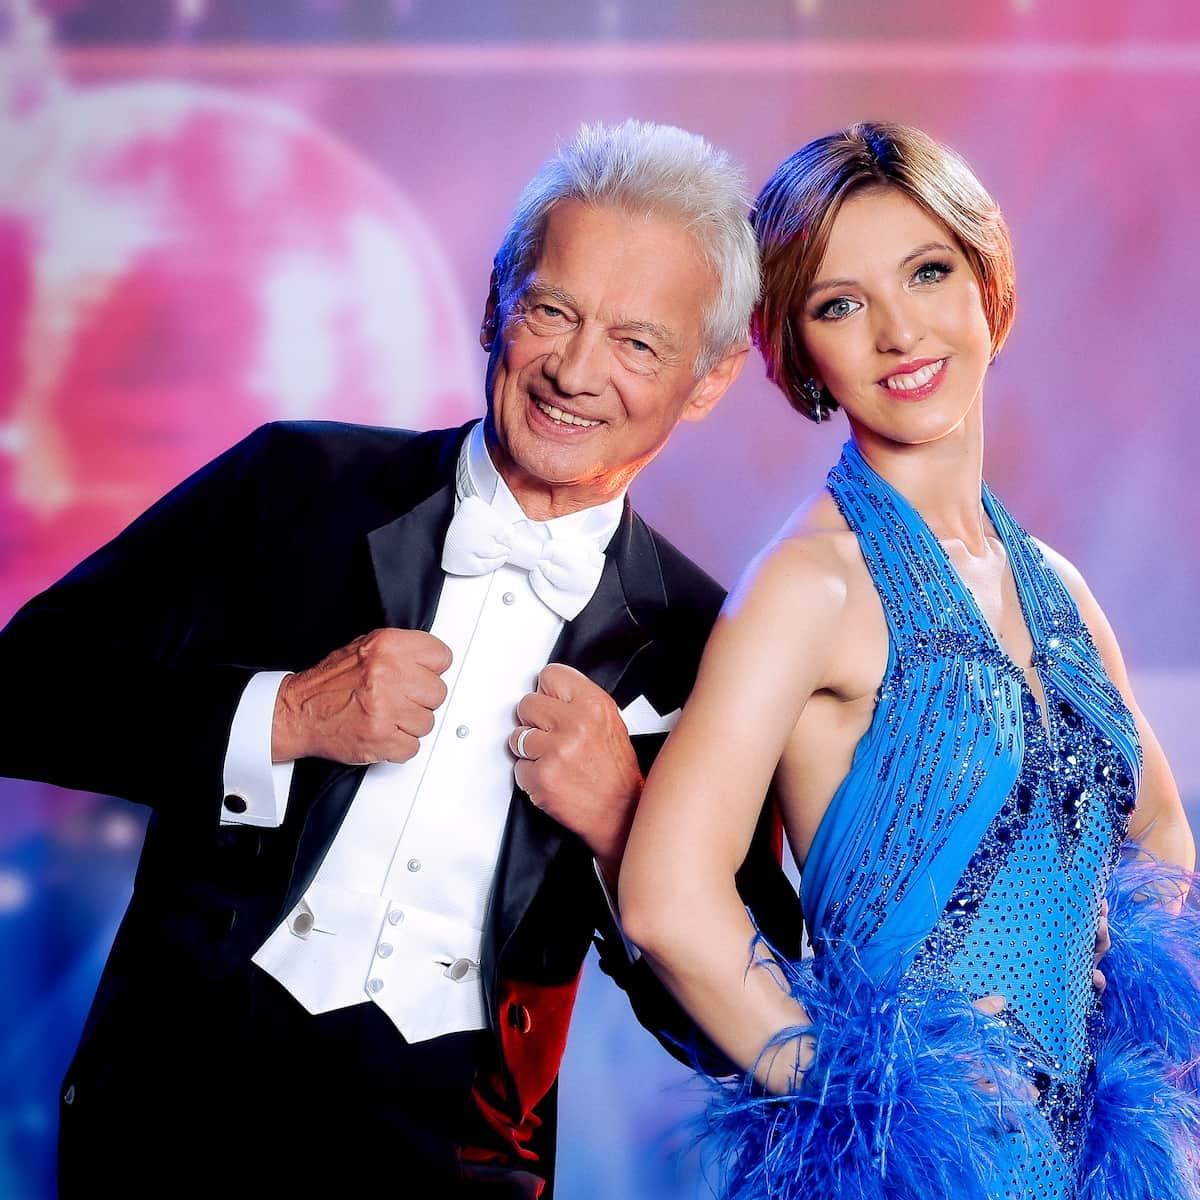 Boris Bukowski und Julia Burghardt bei den Dancing Stars 24.9.2021